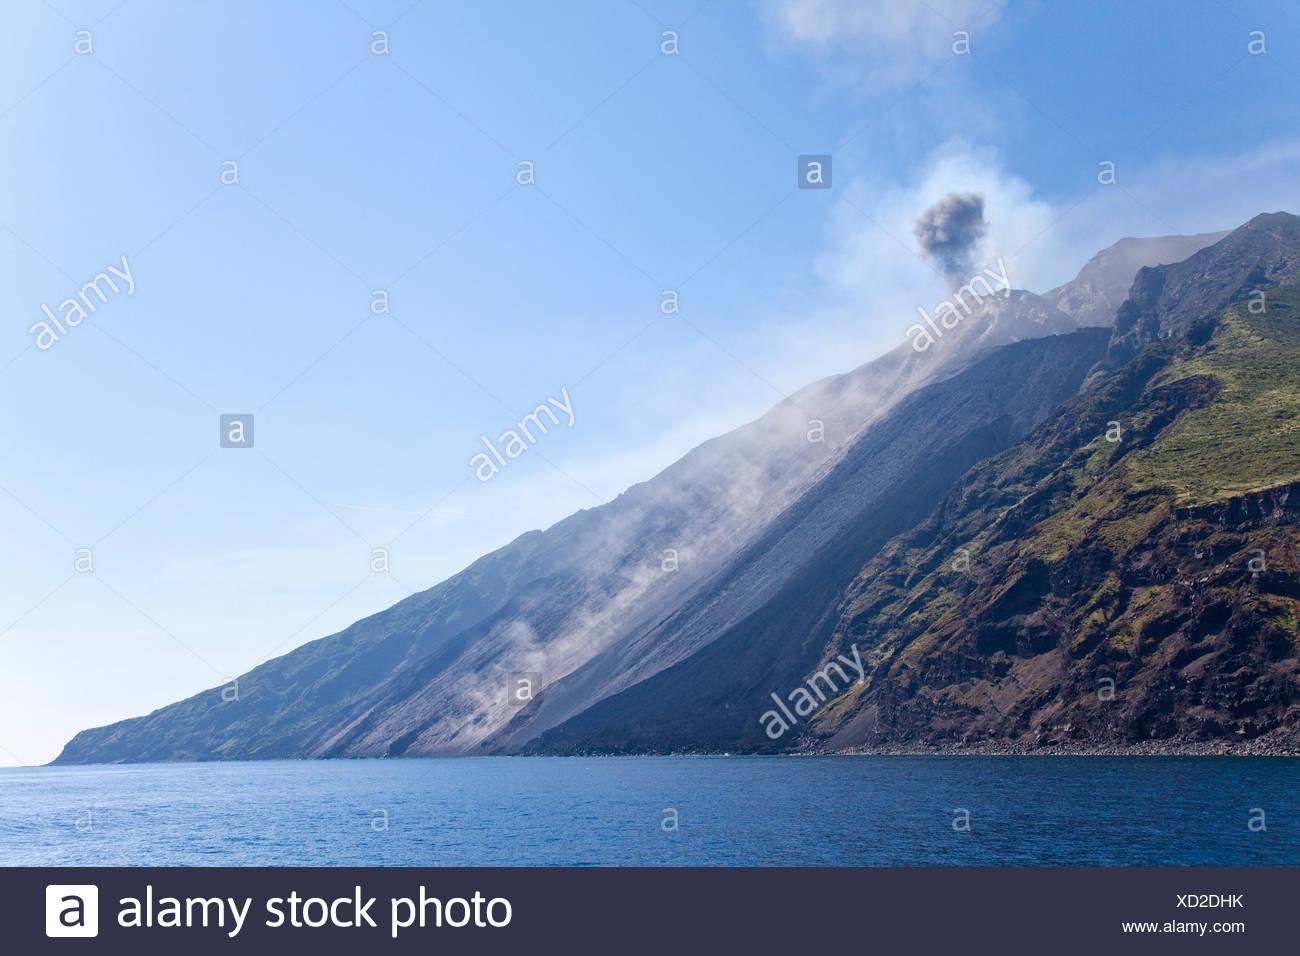 Volcano Stromboli erupting a cloud of smoke, Italy - Stock Image